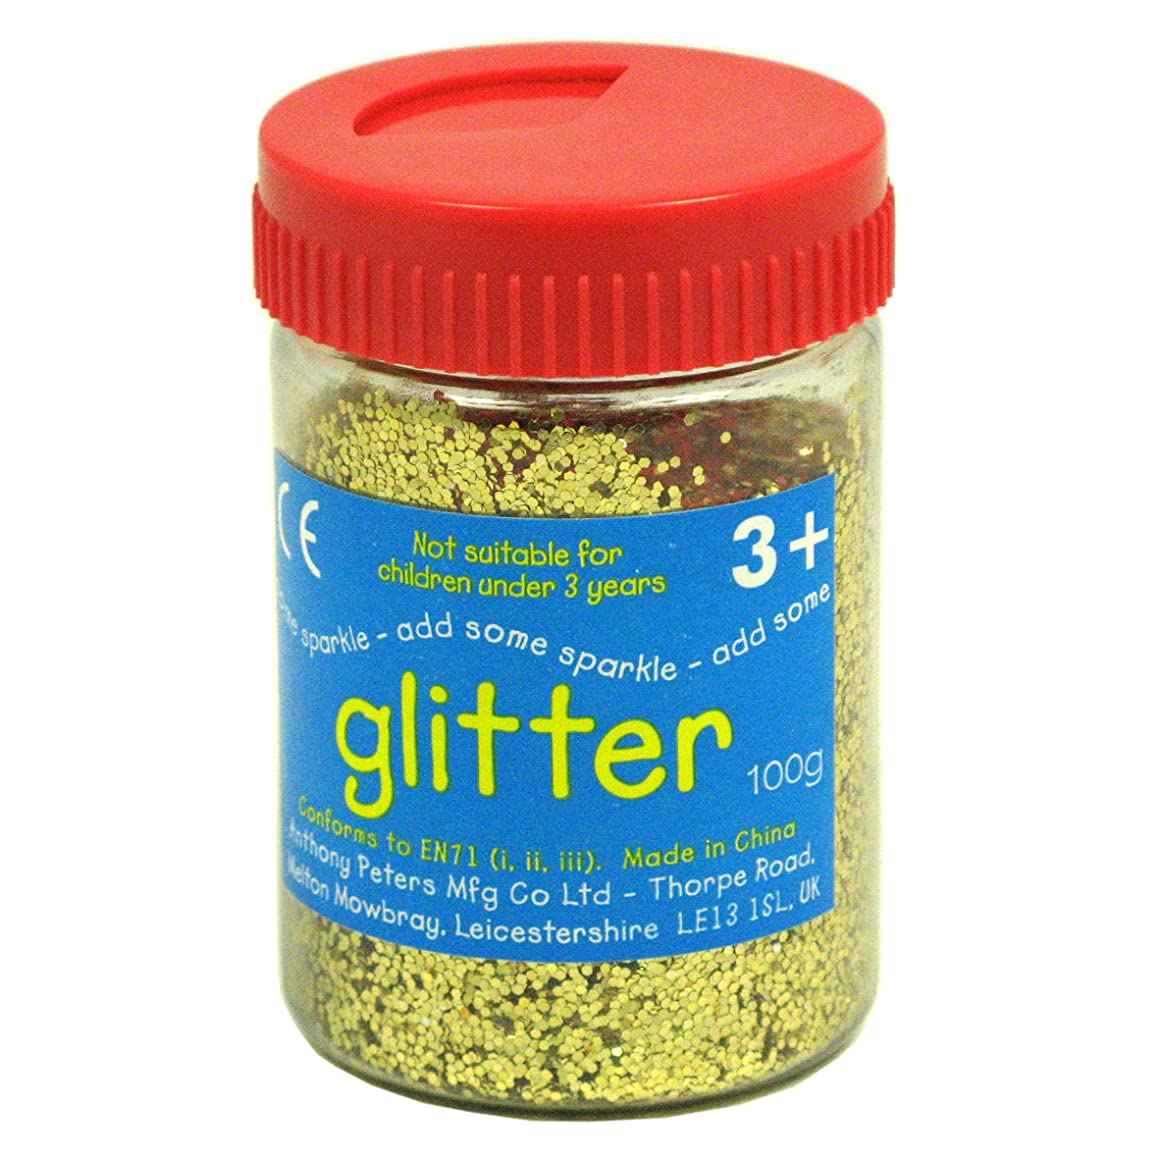 100g Gold Kids Craft Glitter in Shaker Dispenser | Craft Glitter